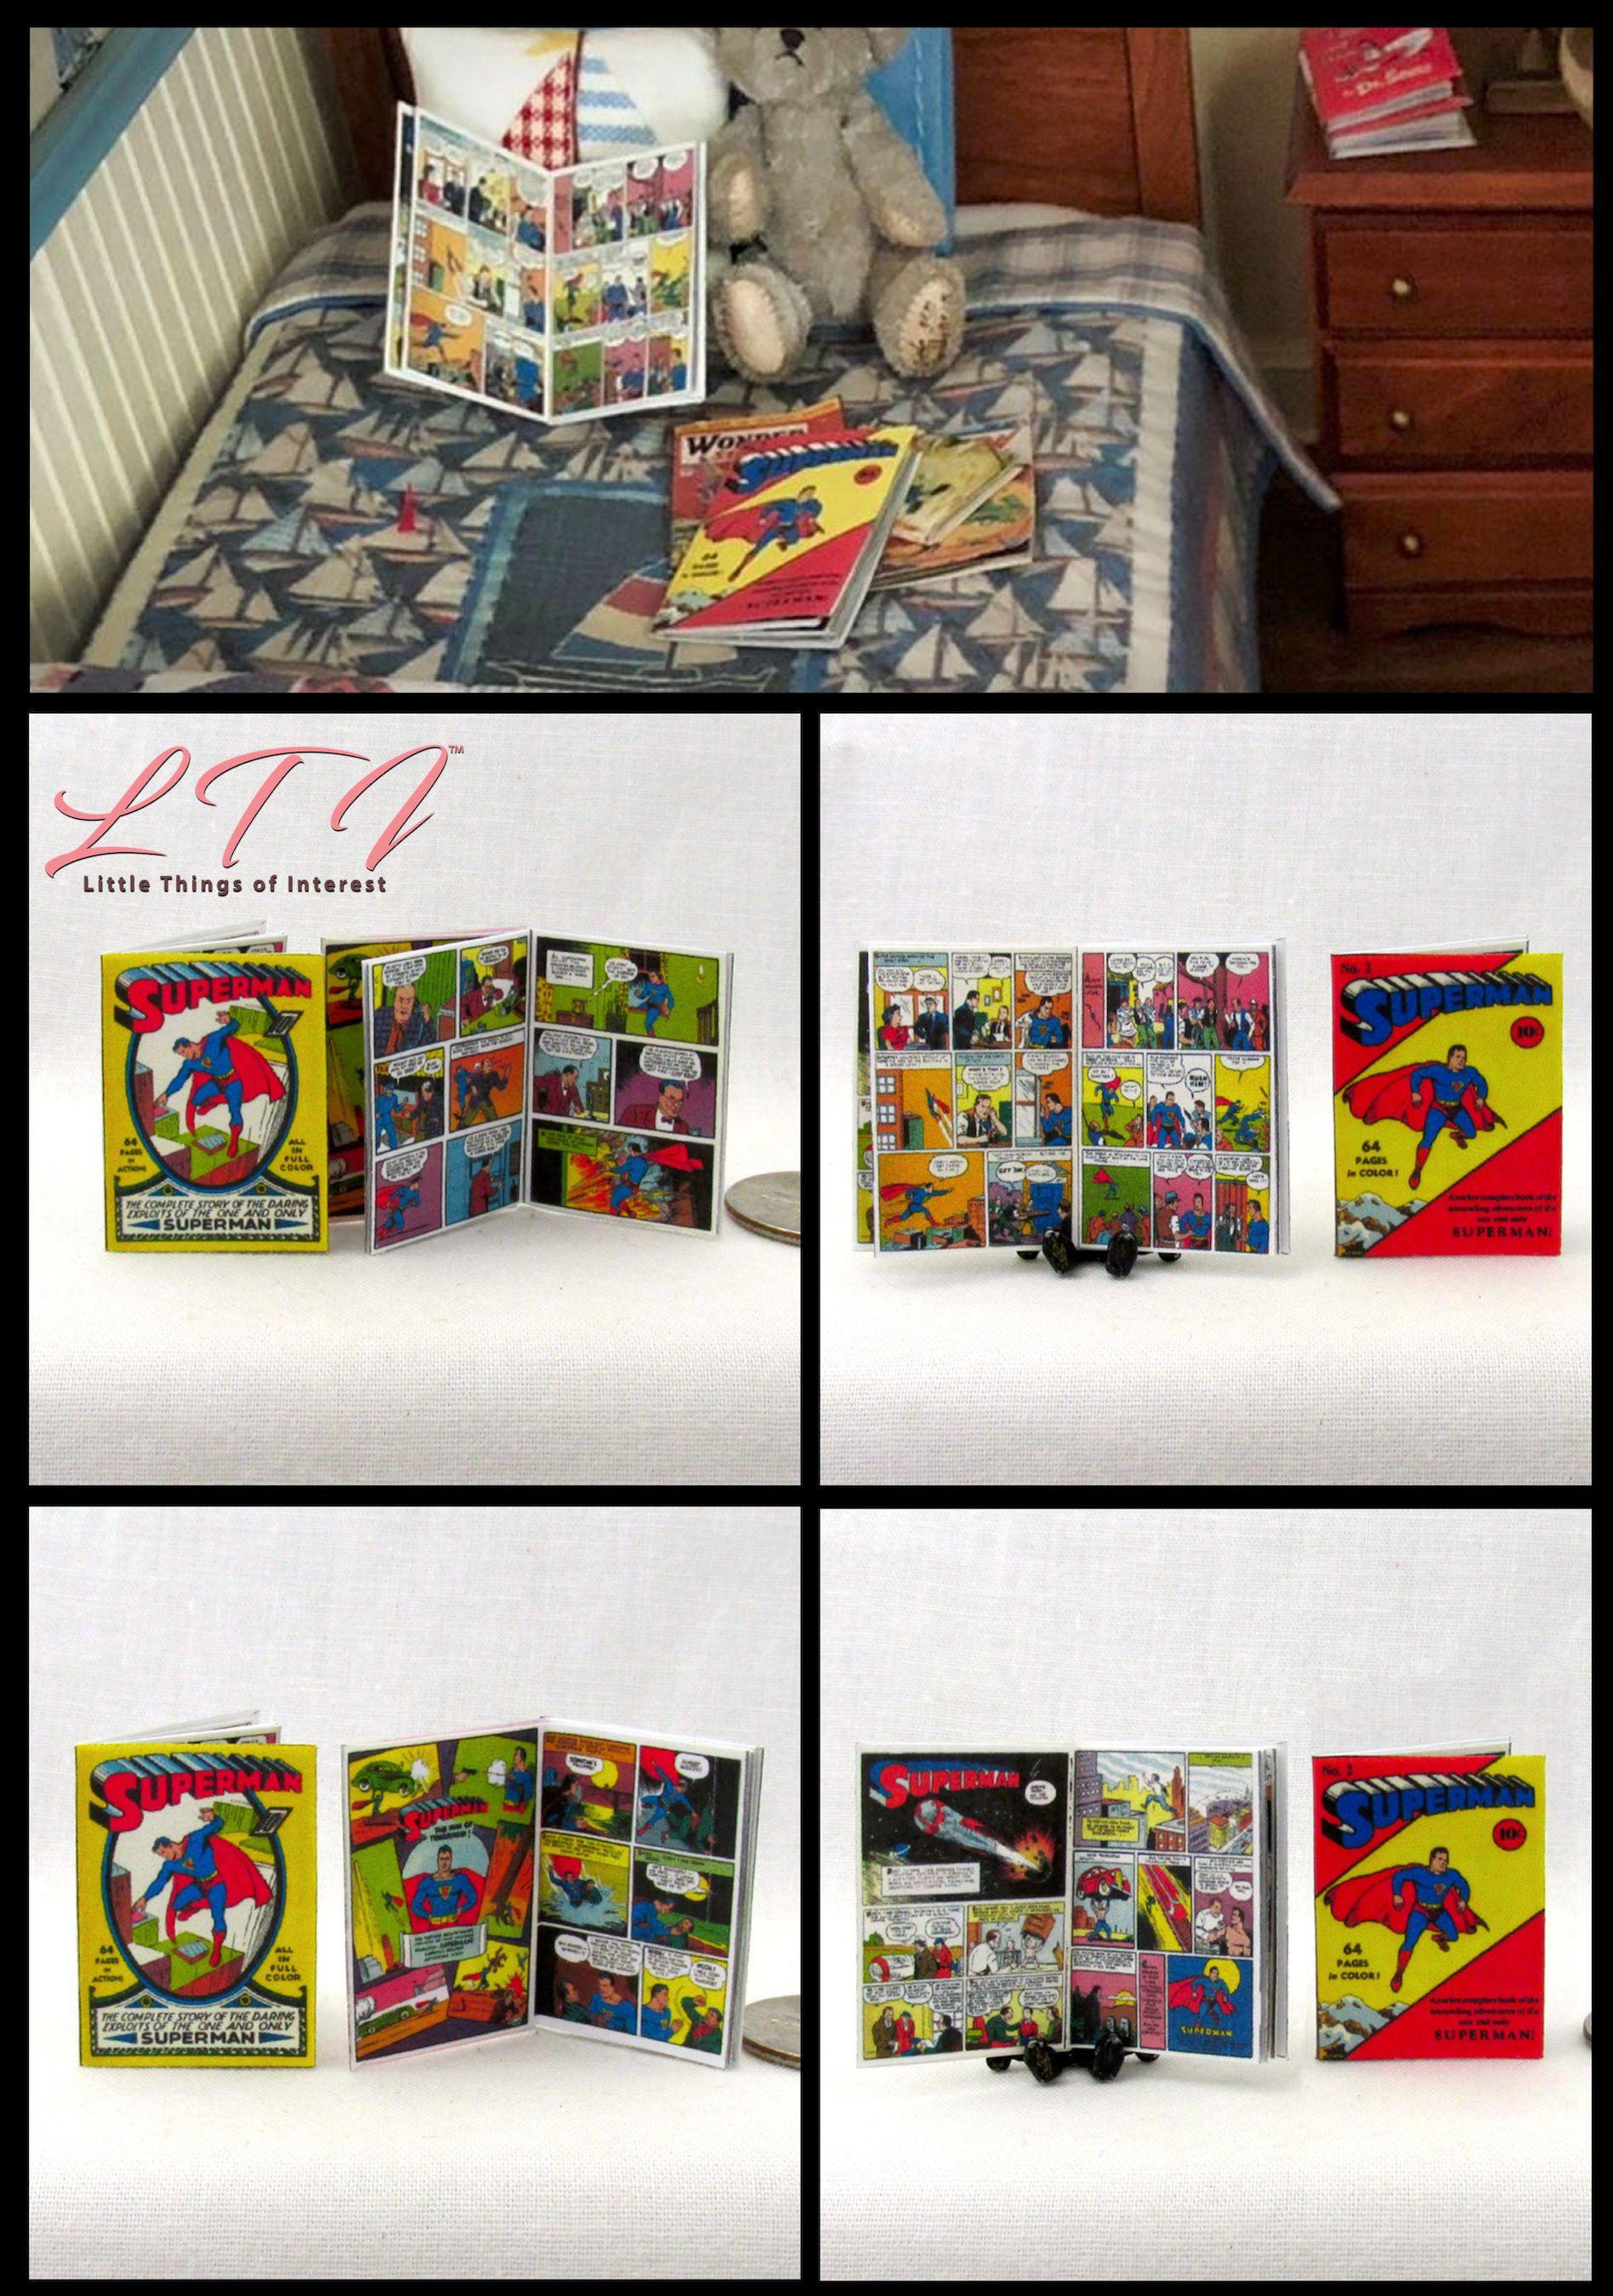 2 Miniature JUSTICE LEAGUE COMIC Books Dollhouse Readable 1:12 Scale 2 FOR 1 DC